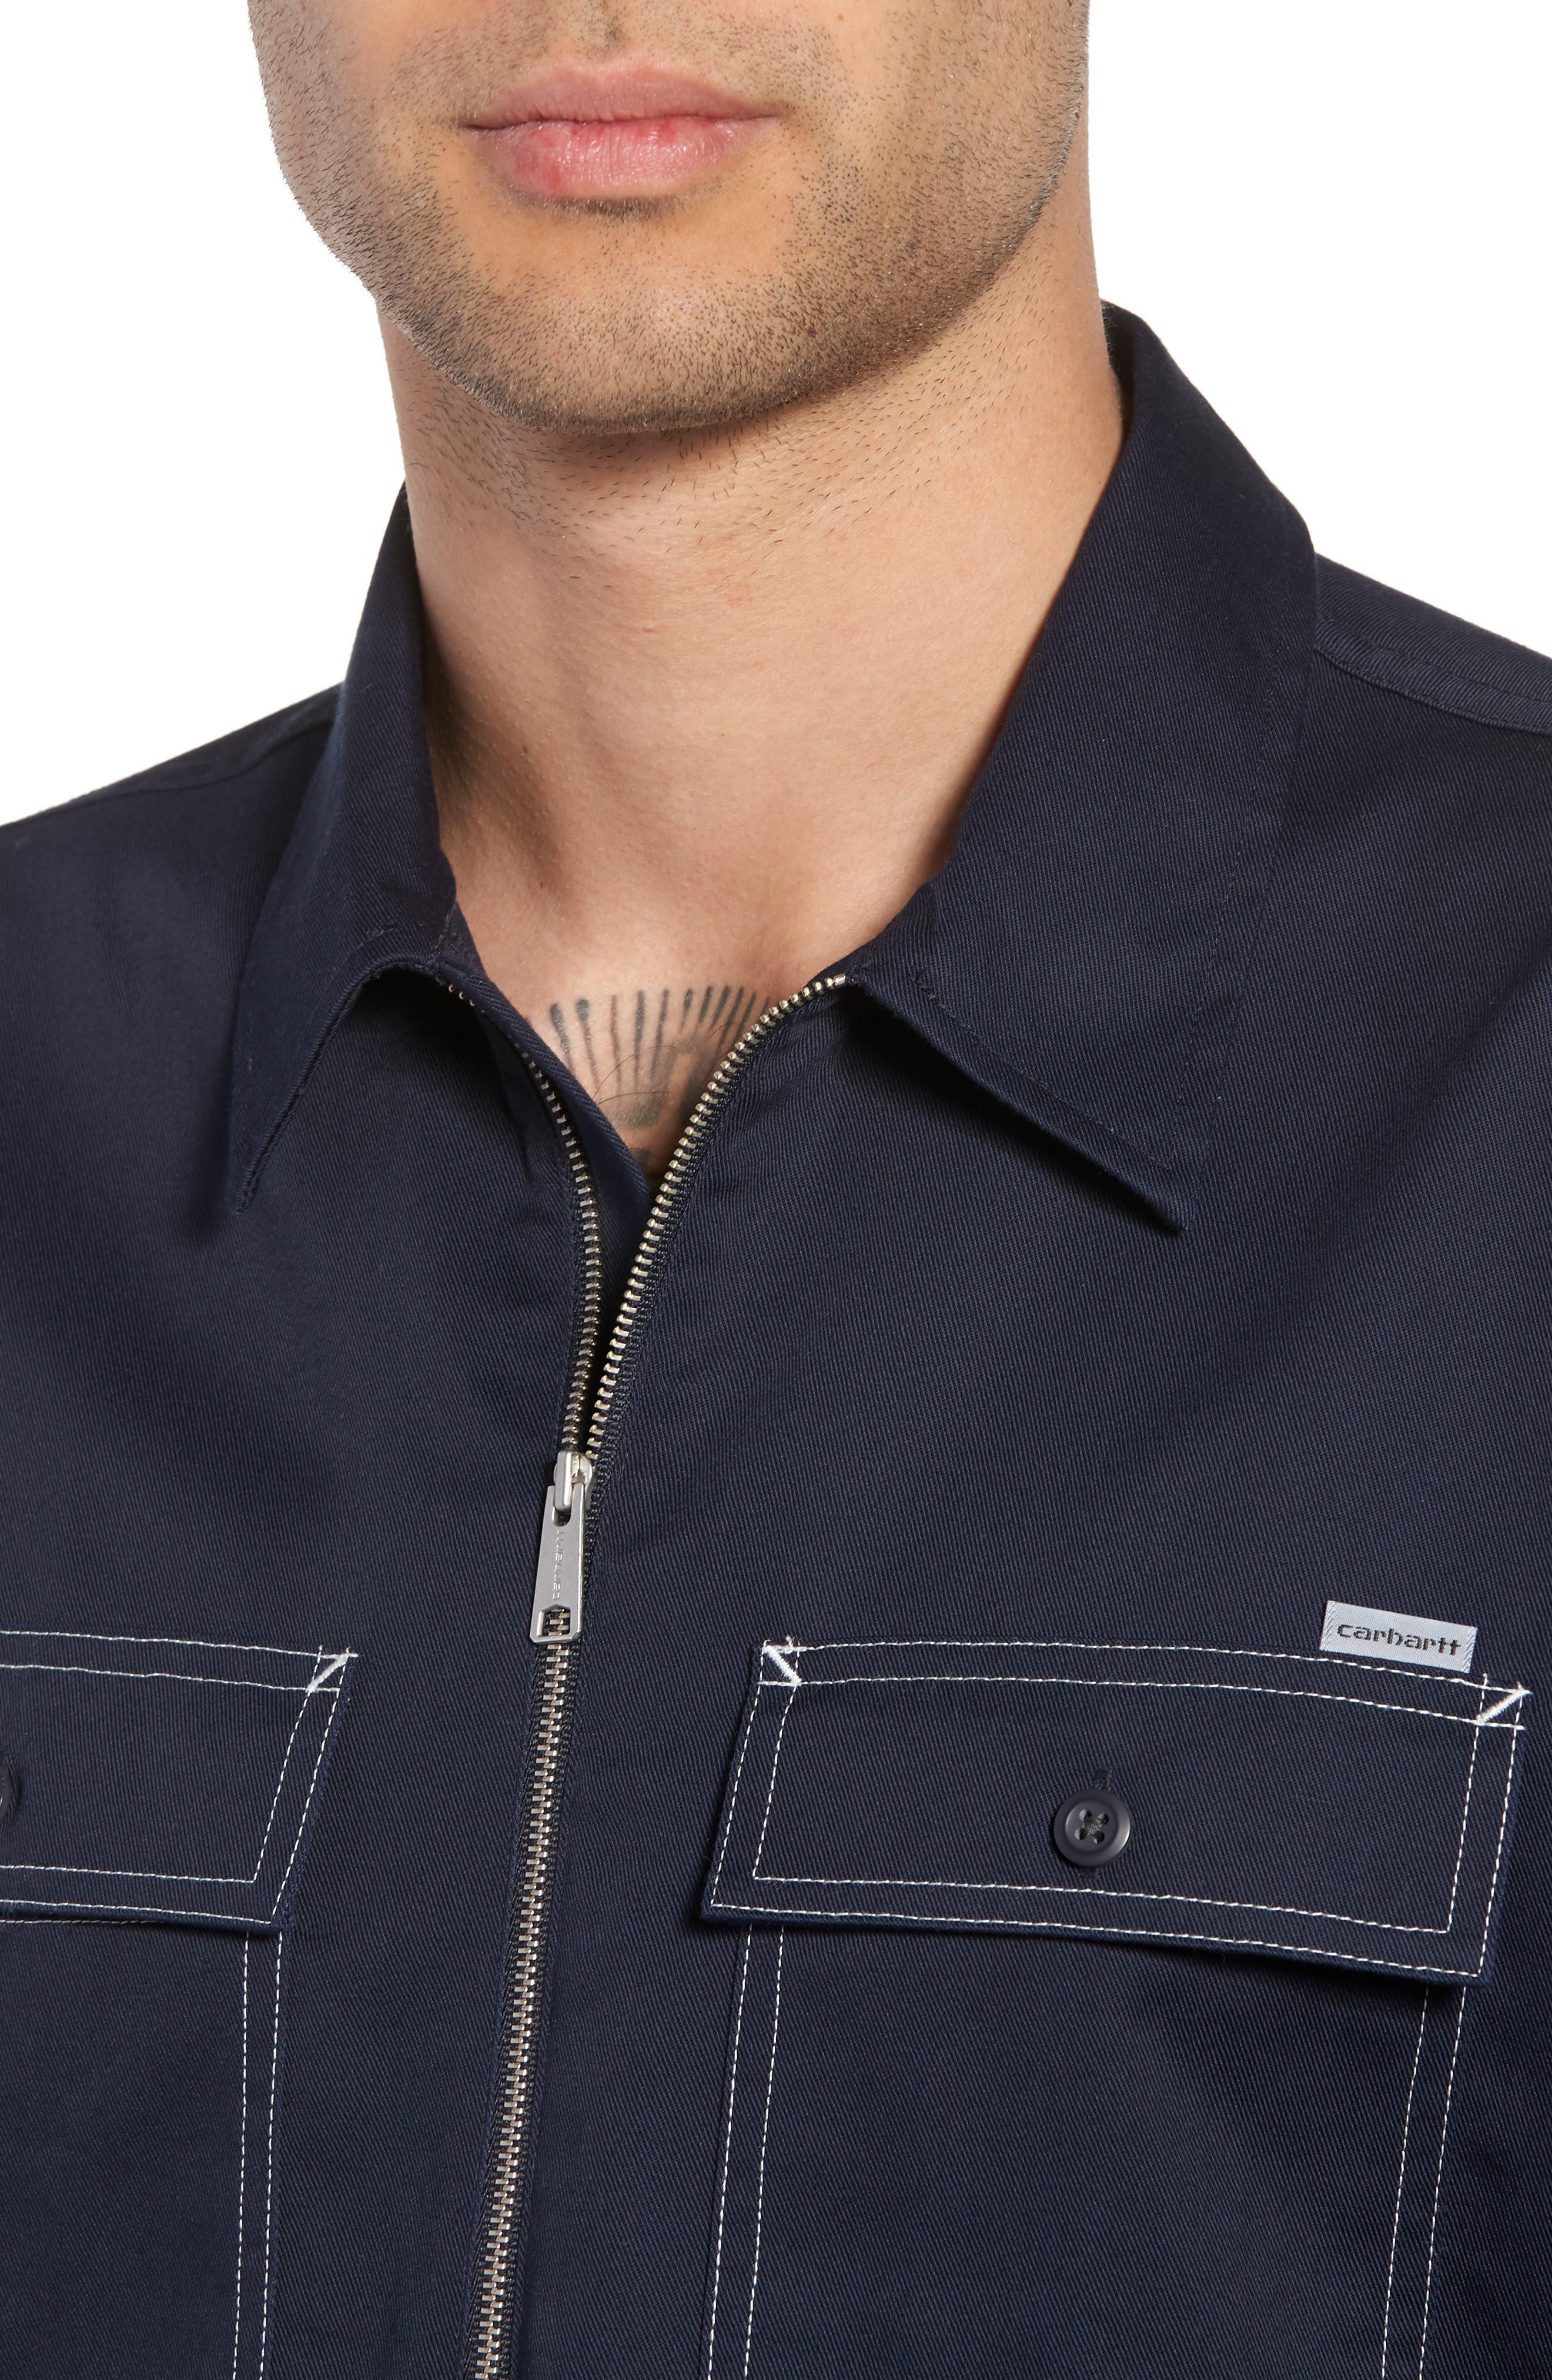 Medford Woven Shirt,                             Alternate thumbnail 4, color,                             401